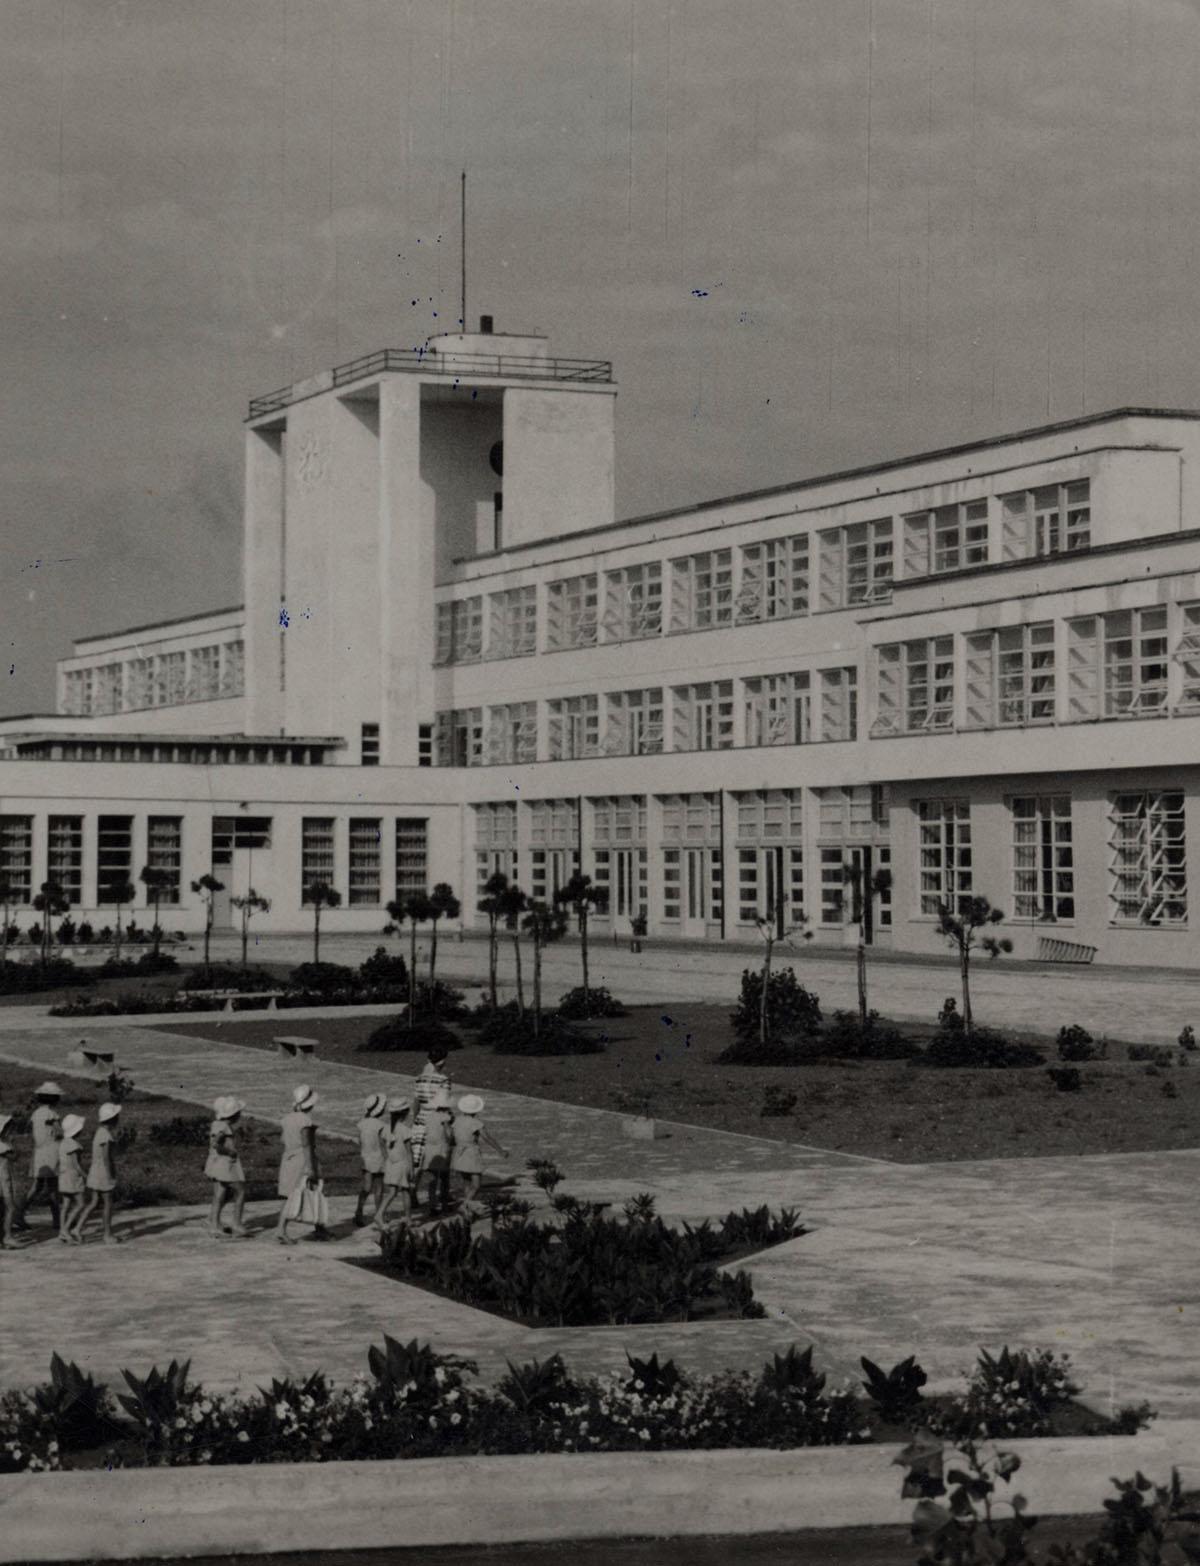 Heliotherapie in Lignano - Pietro Zanini,1935-1939